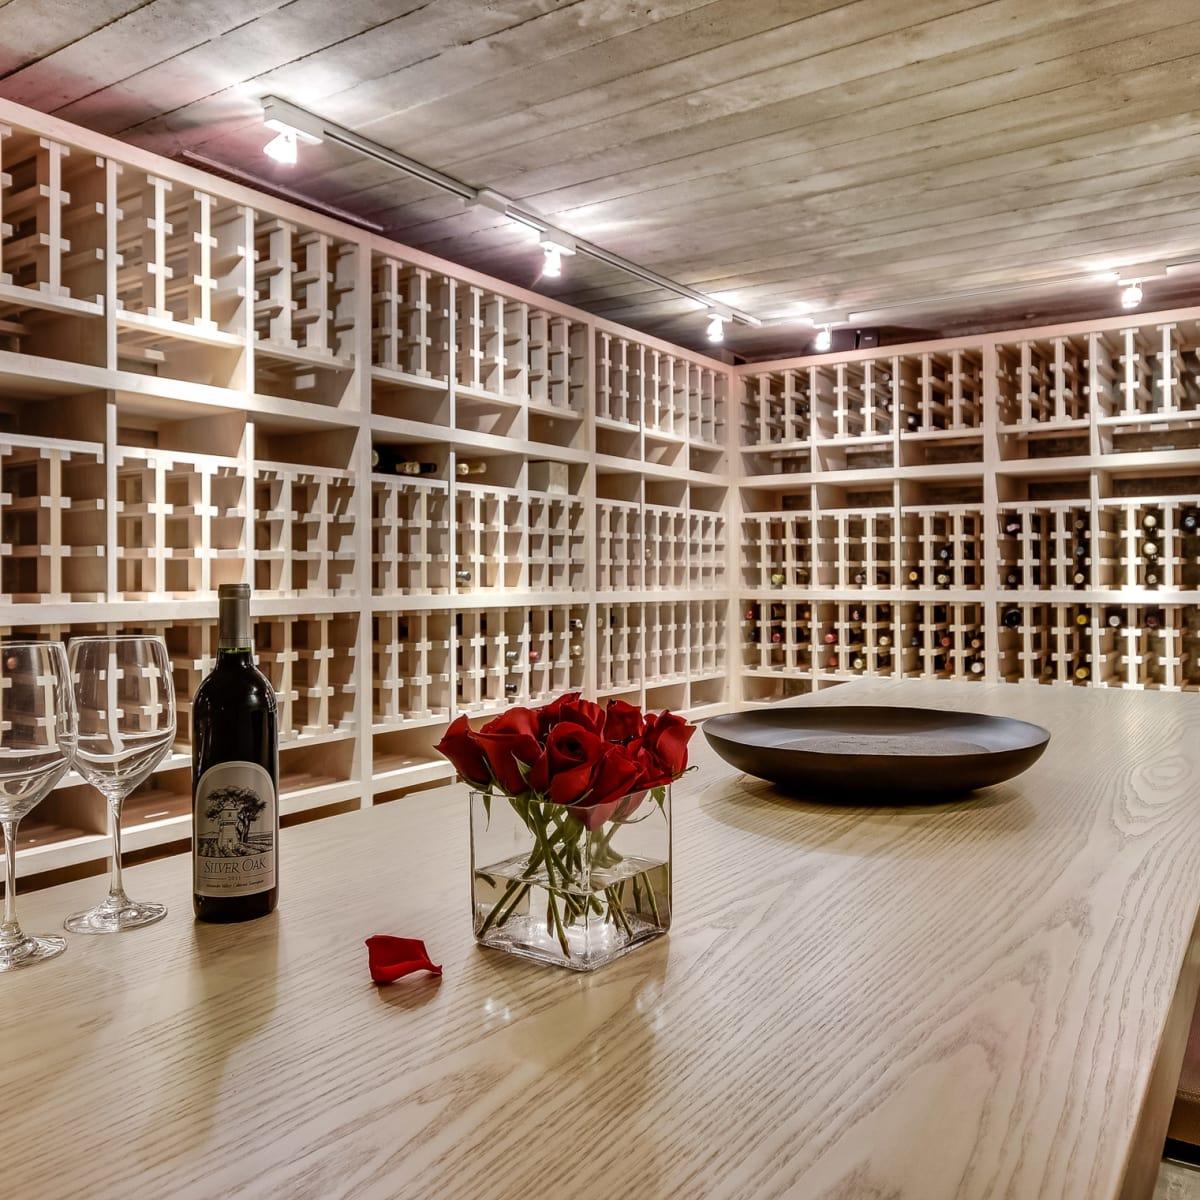 2009 Cueva de Oro Austin house for sale wine cellar